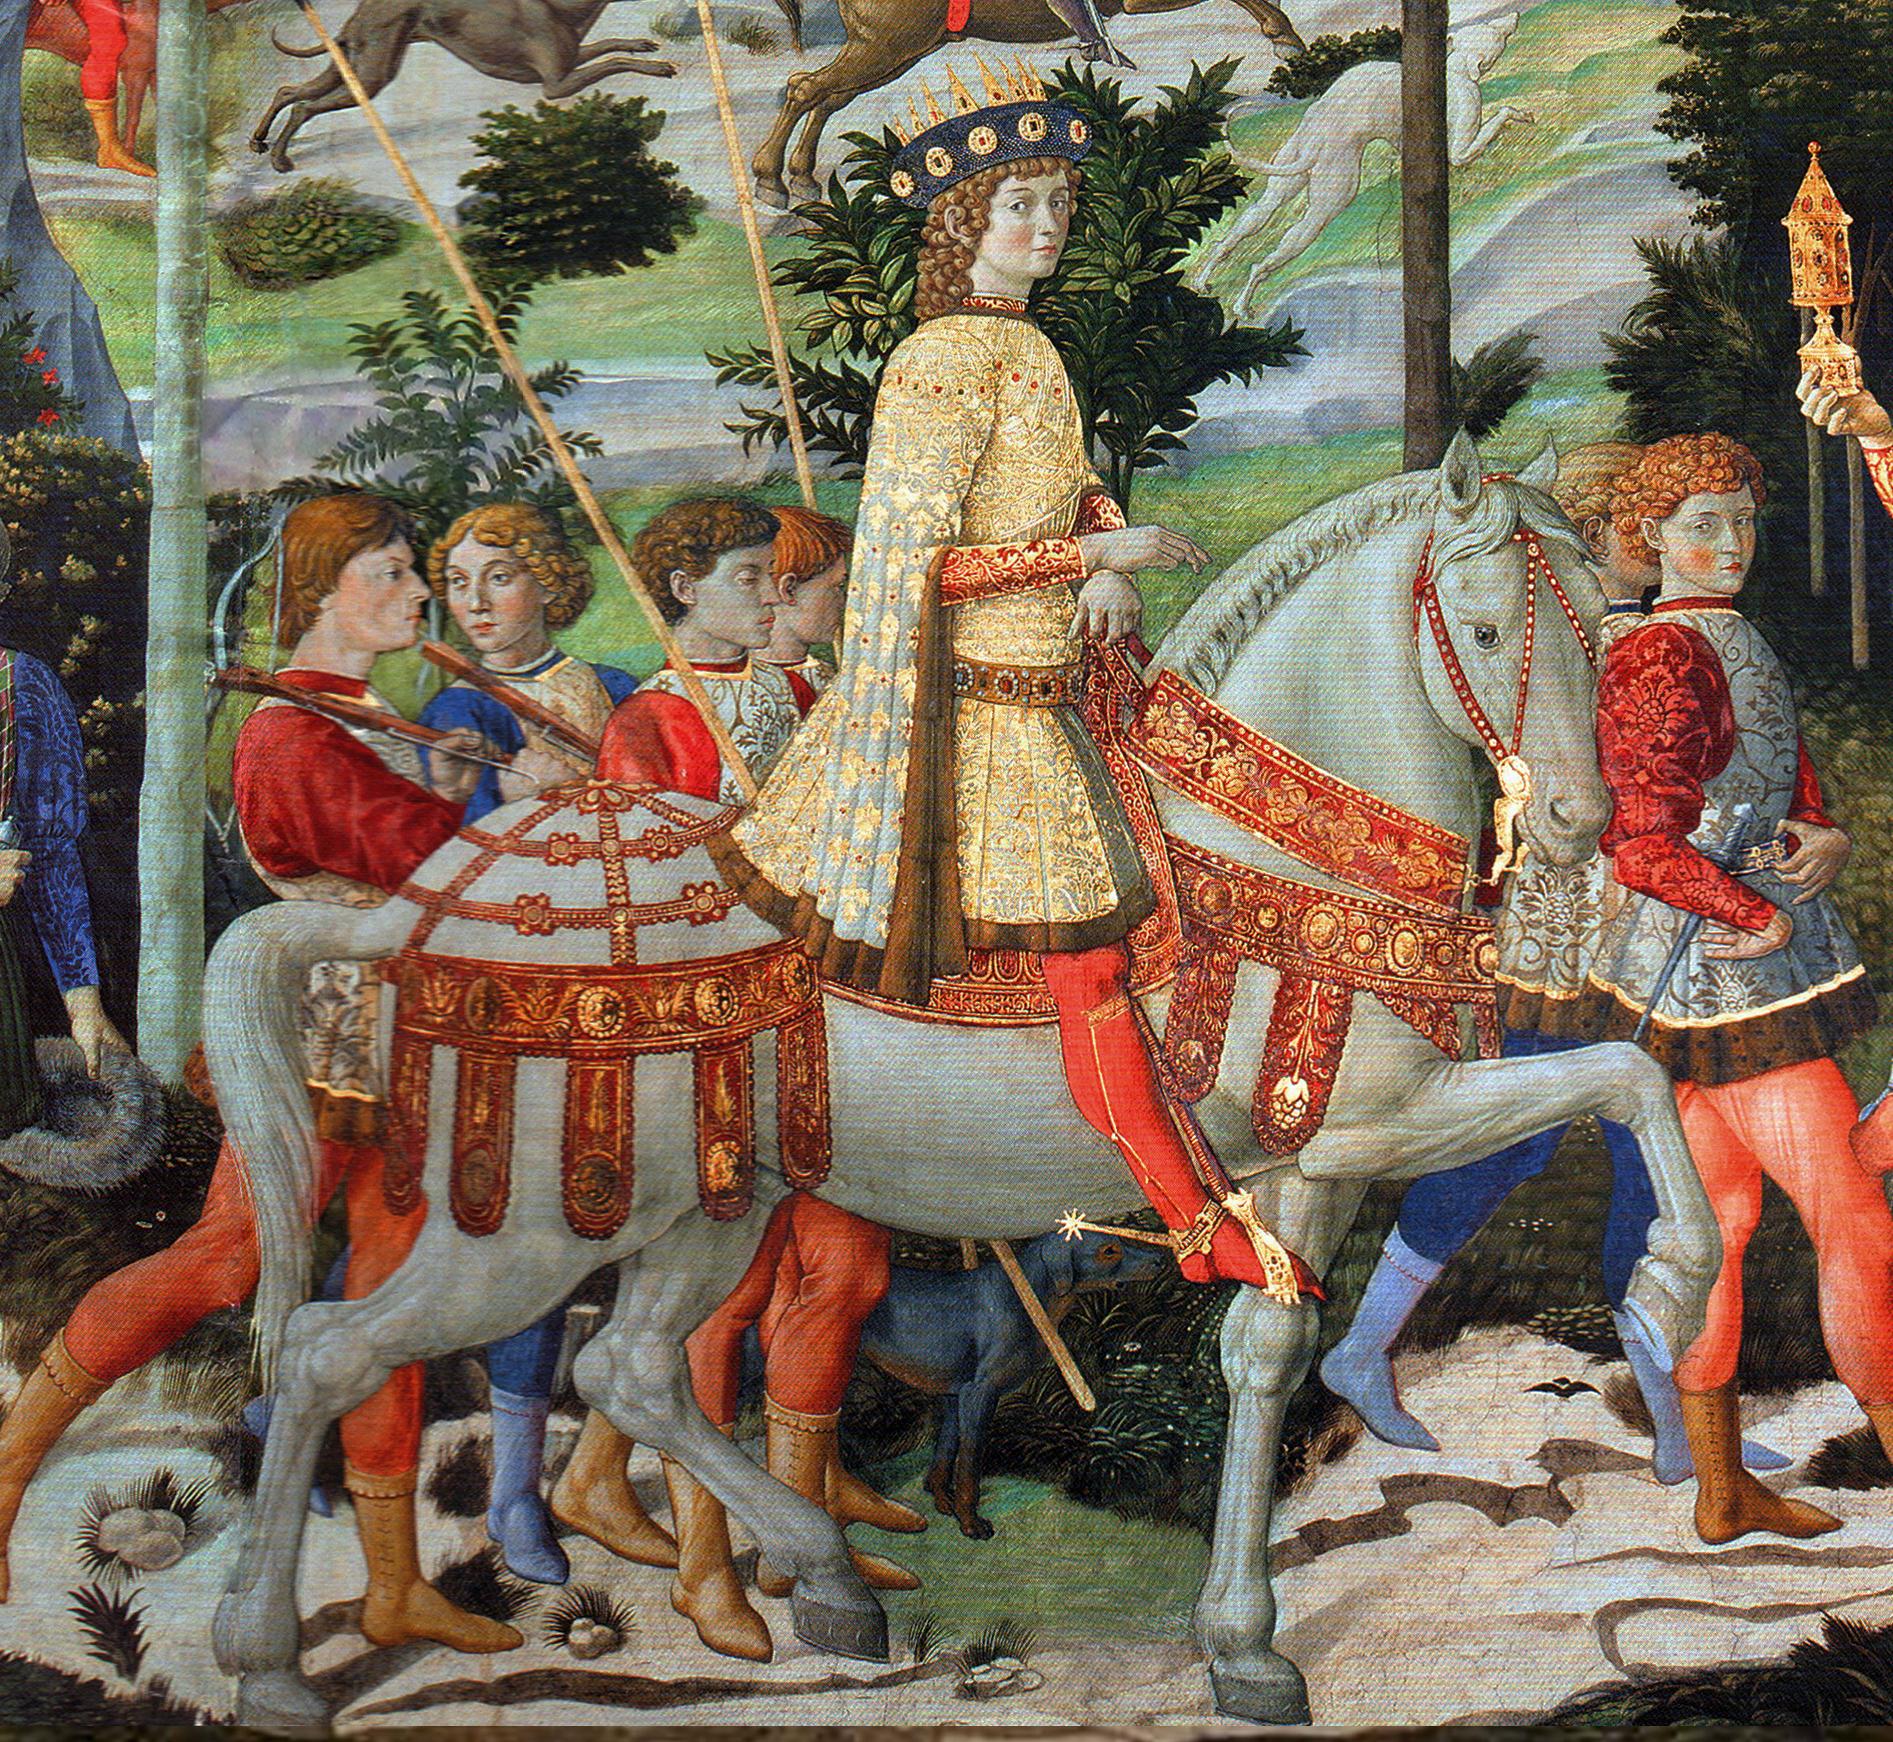 procession du plus jeune roi, gozzoli